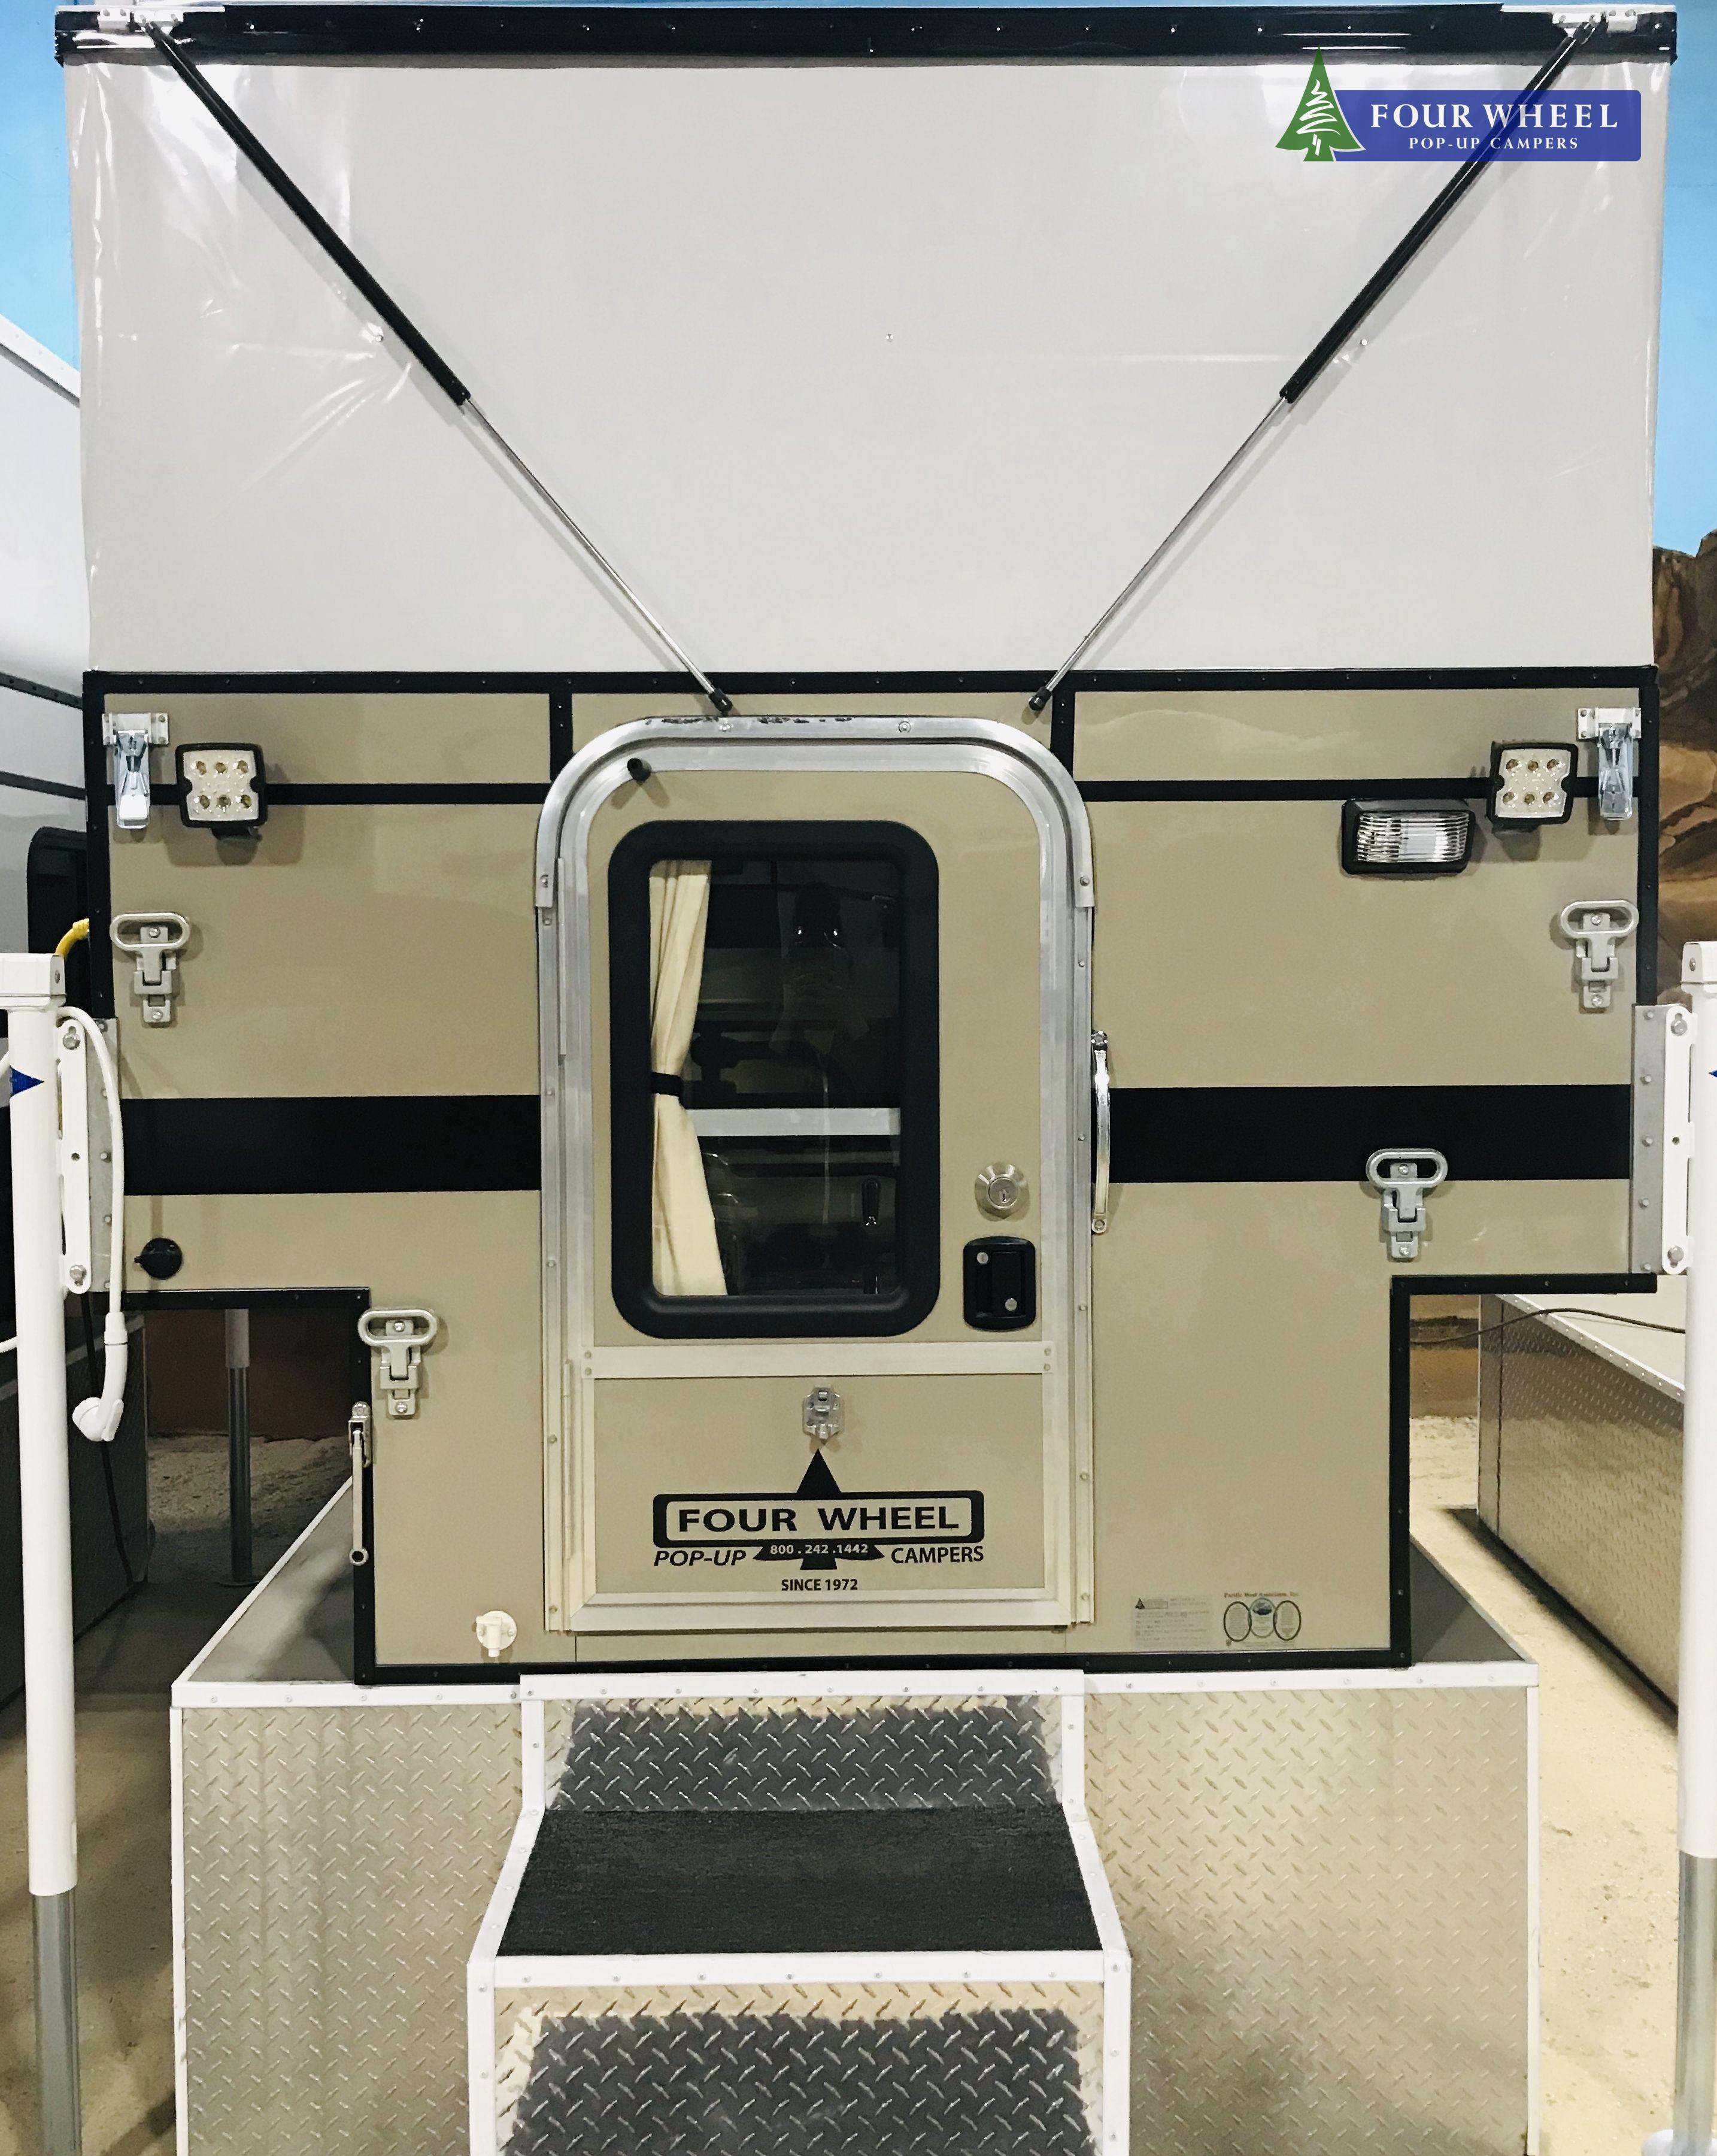 New Smooth Khaki Camper Khaki Fwc Fourwheelpopupcamper